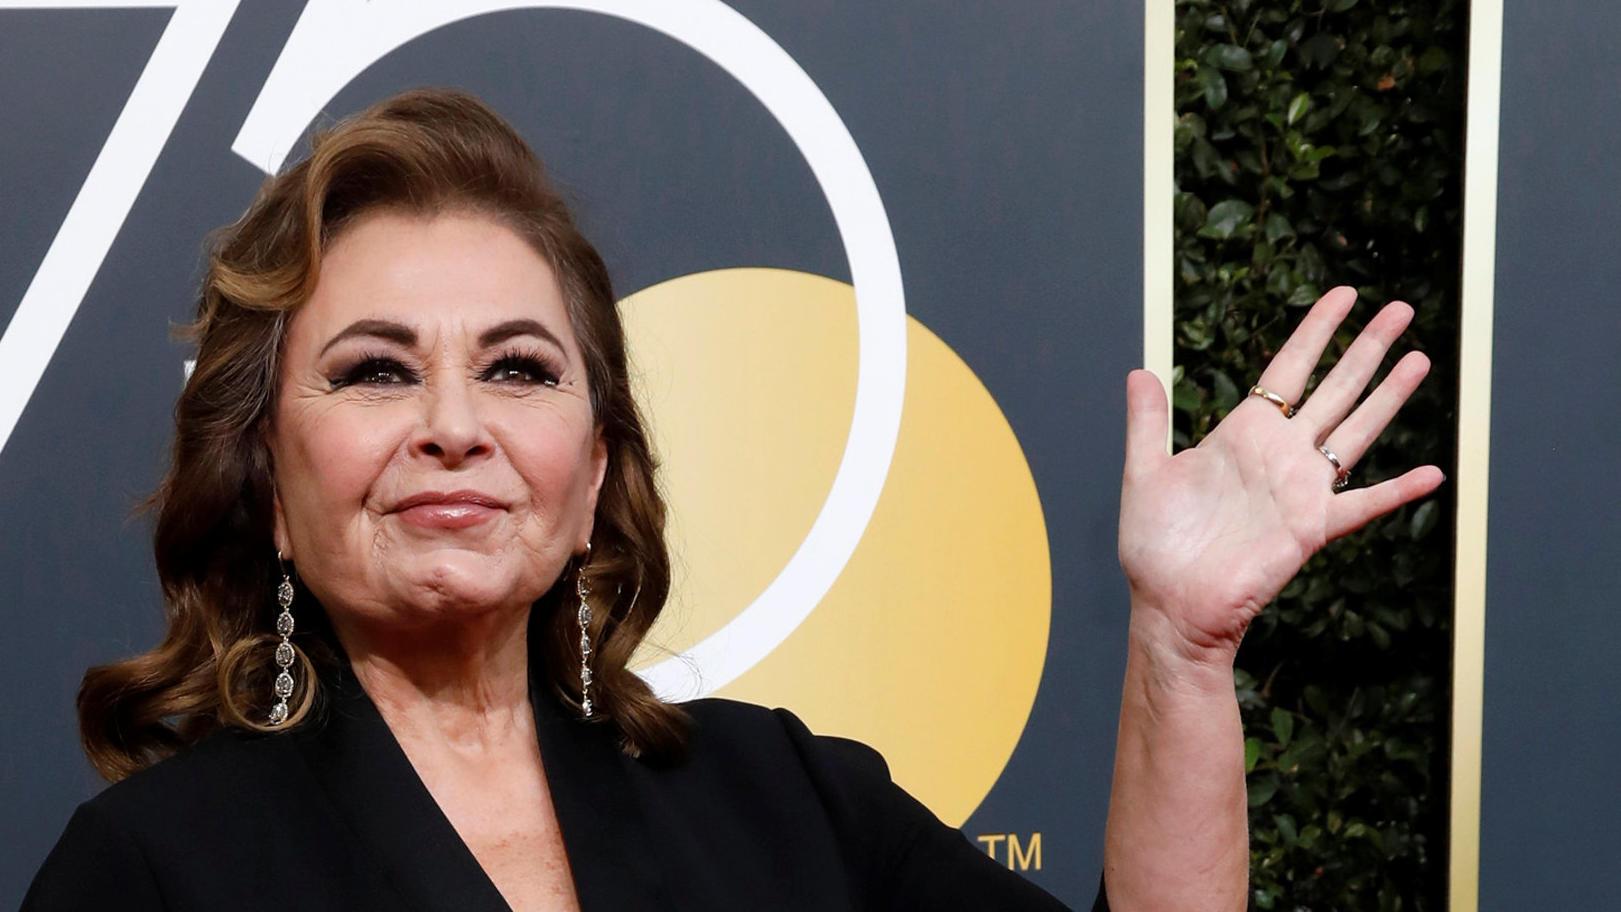 Roseanne Barr: Co-Star feuert gegen Schauspielerin